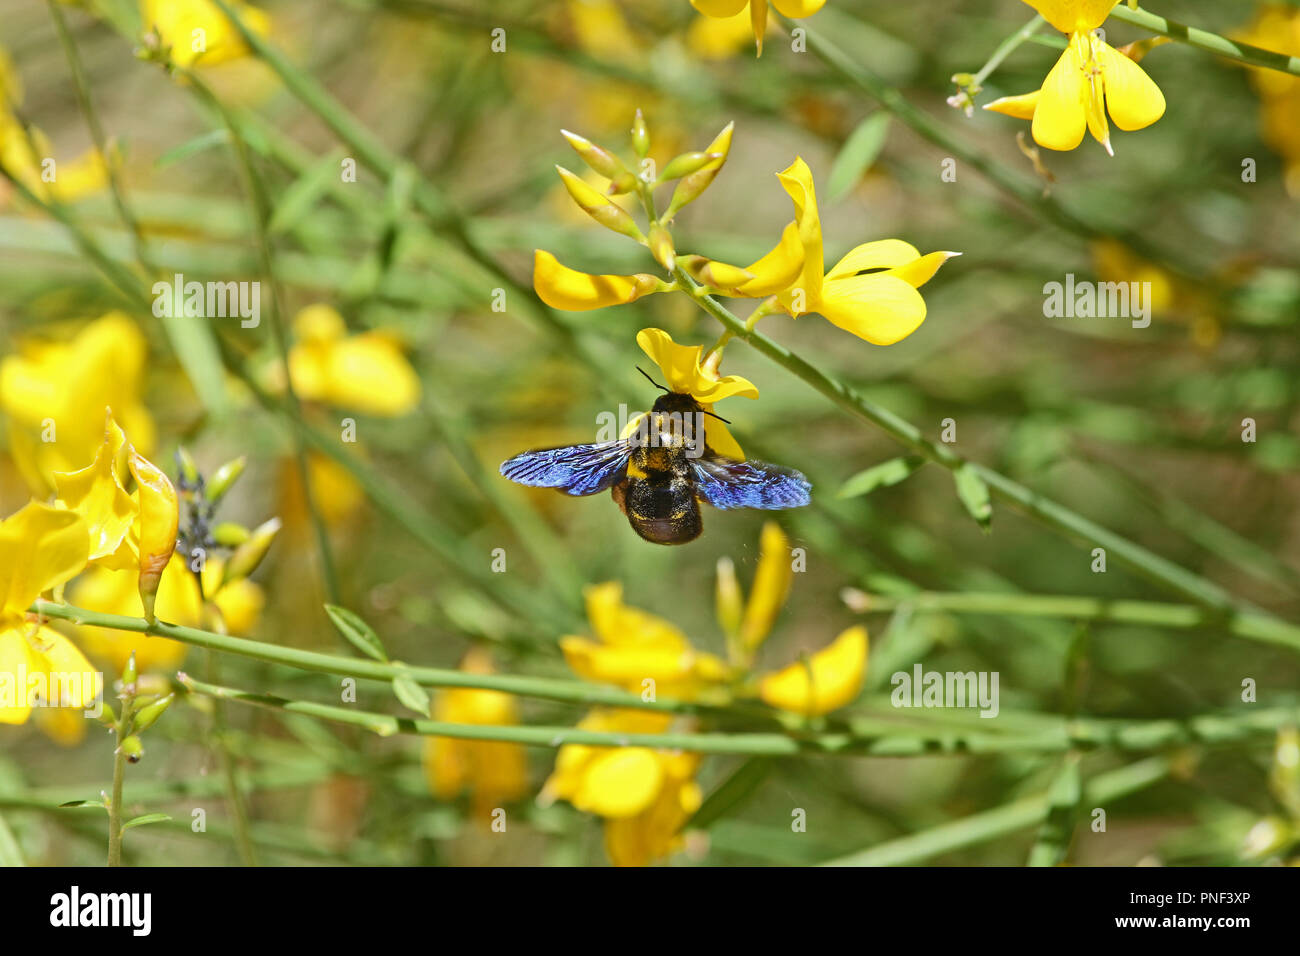 Carpenter bee latin name xylocopa violacea on yellow broom or carpenter bee latin name xylocopa violacea on yellow broom or ginsestra flower latin name cytisus scoparius or spachianus in spring in italy mightylinksfo